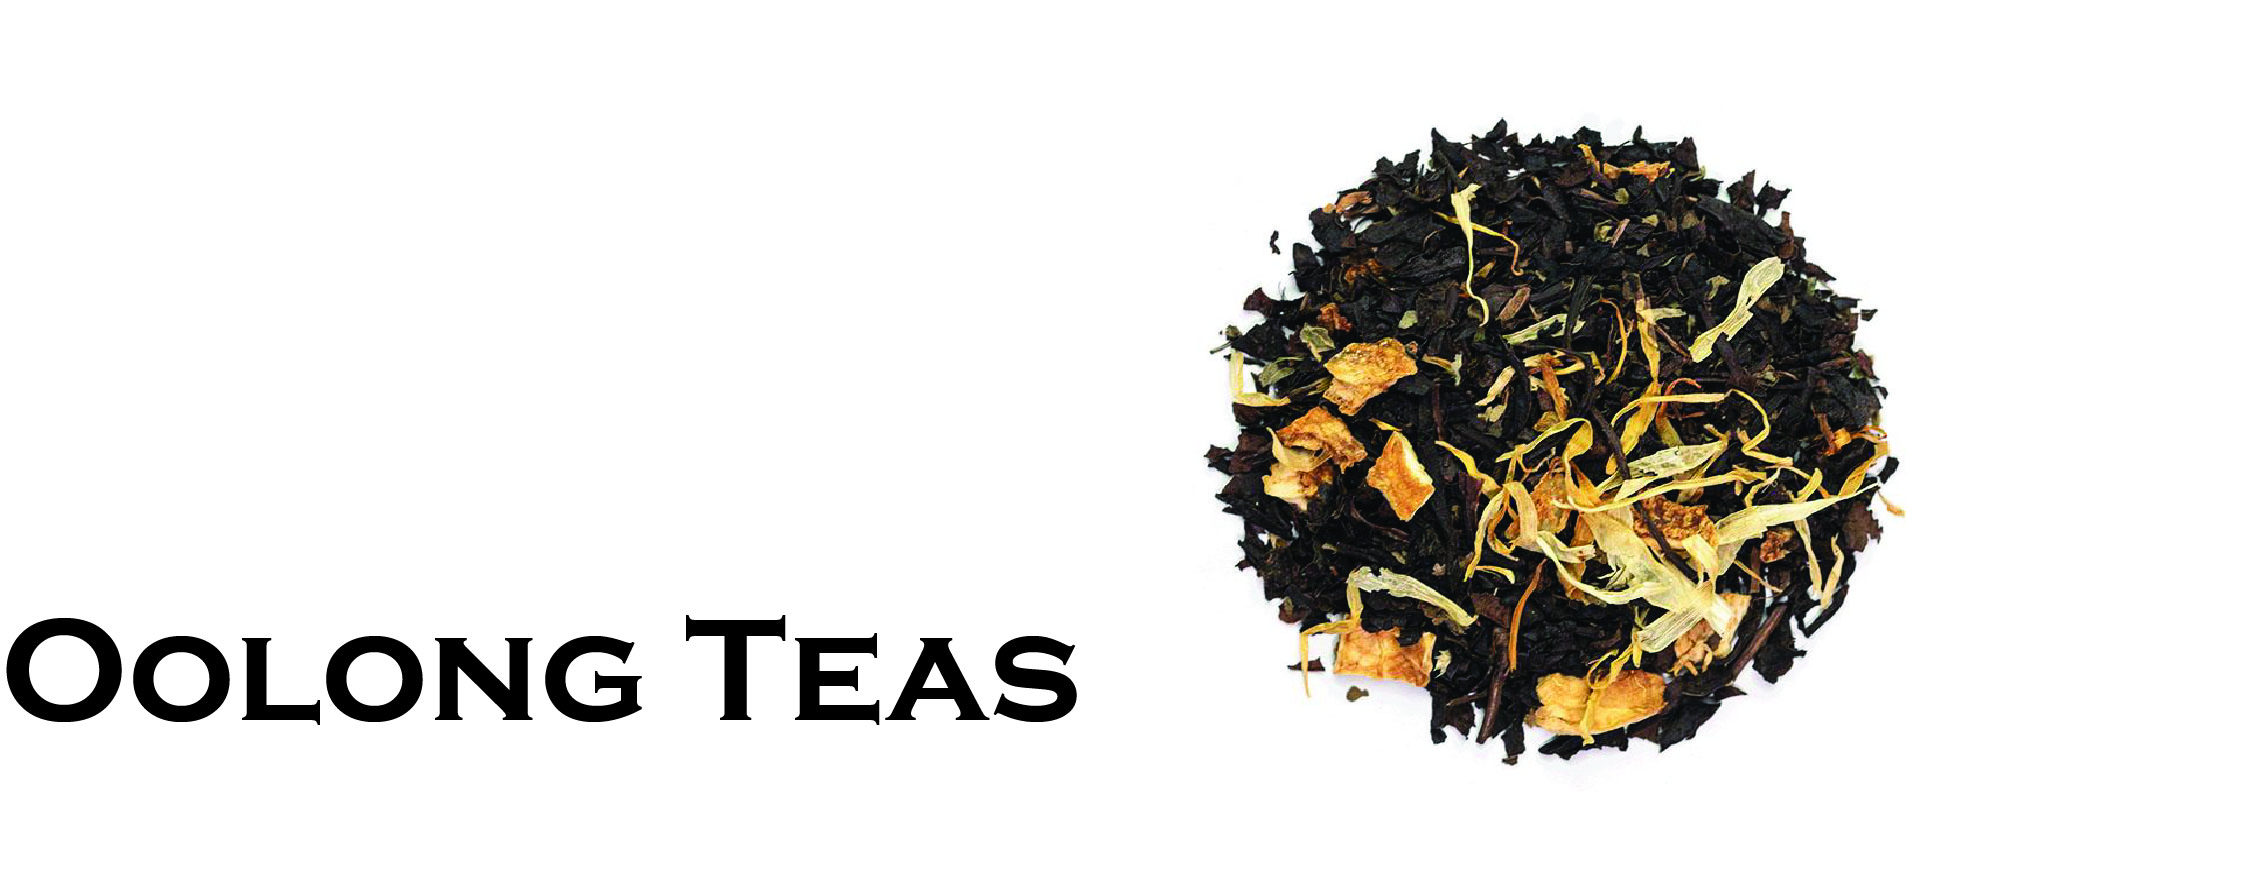 Cuban Brothers Premium Oolong Tea